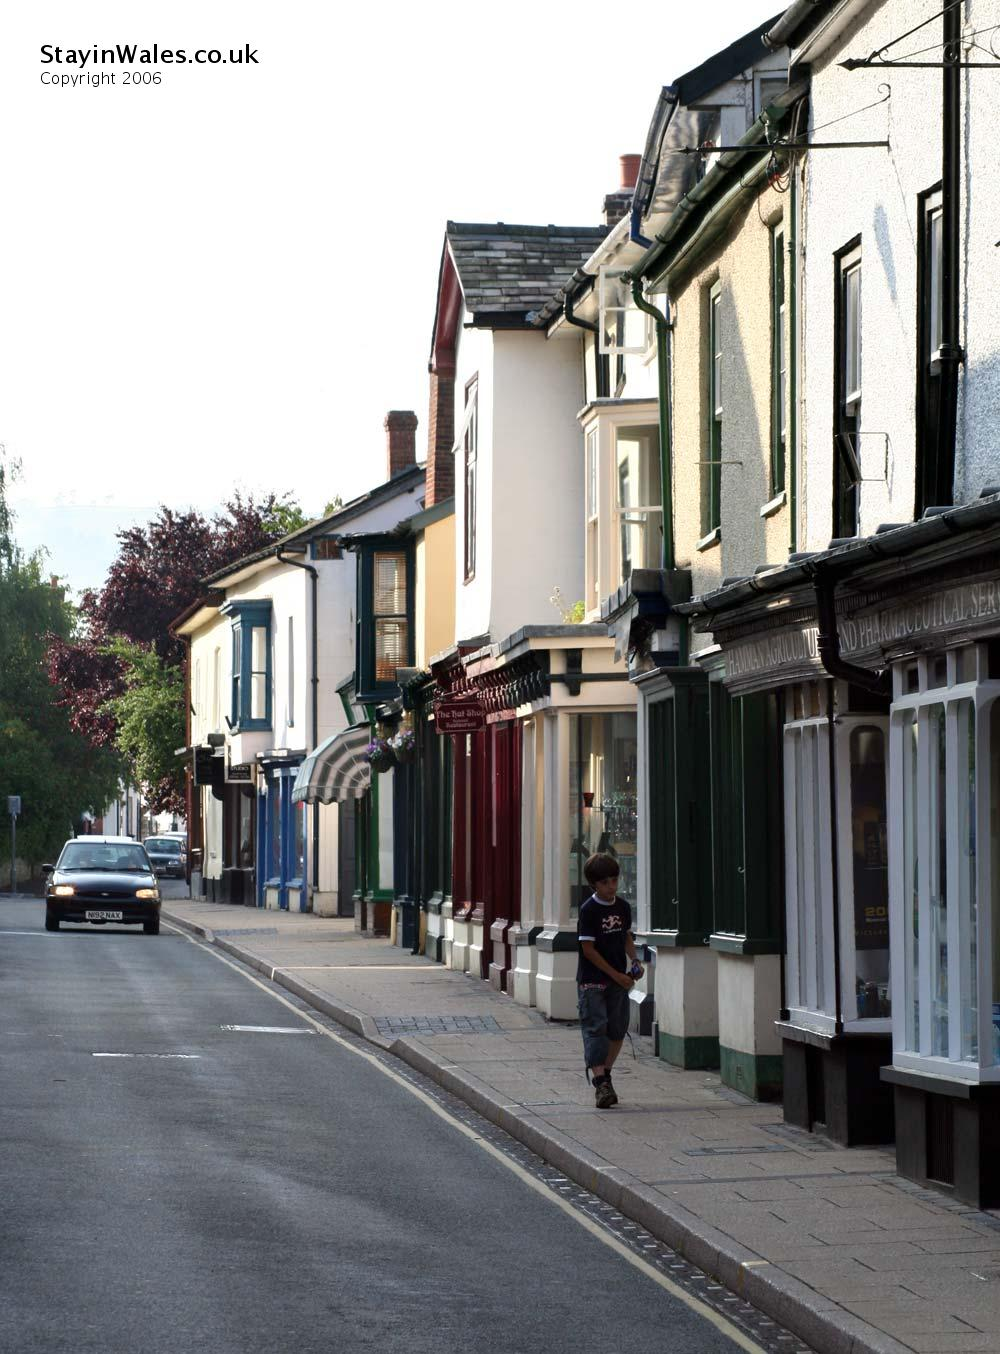 Presteigne in Mid Wales